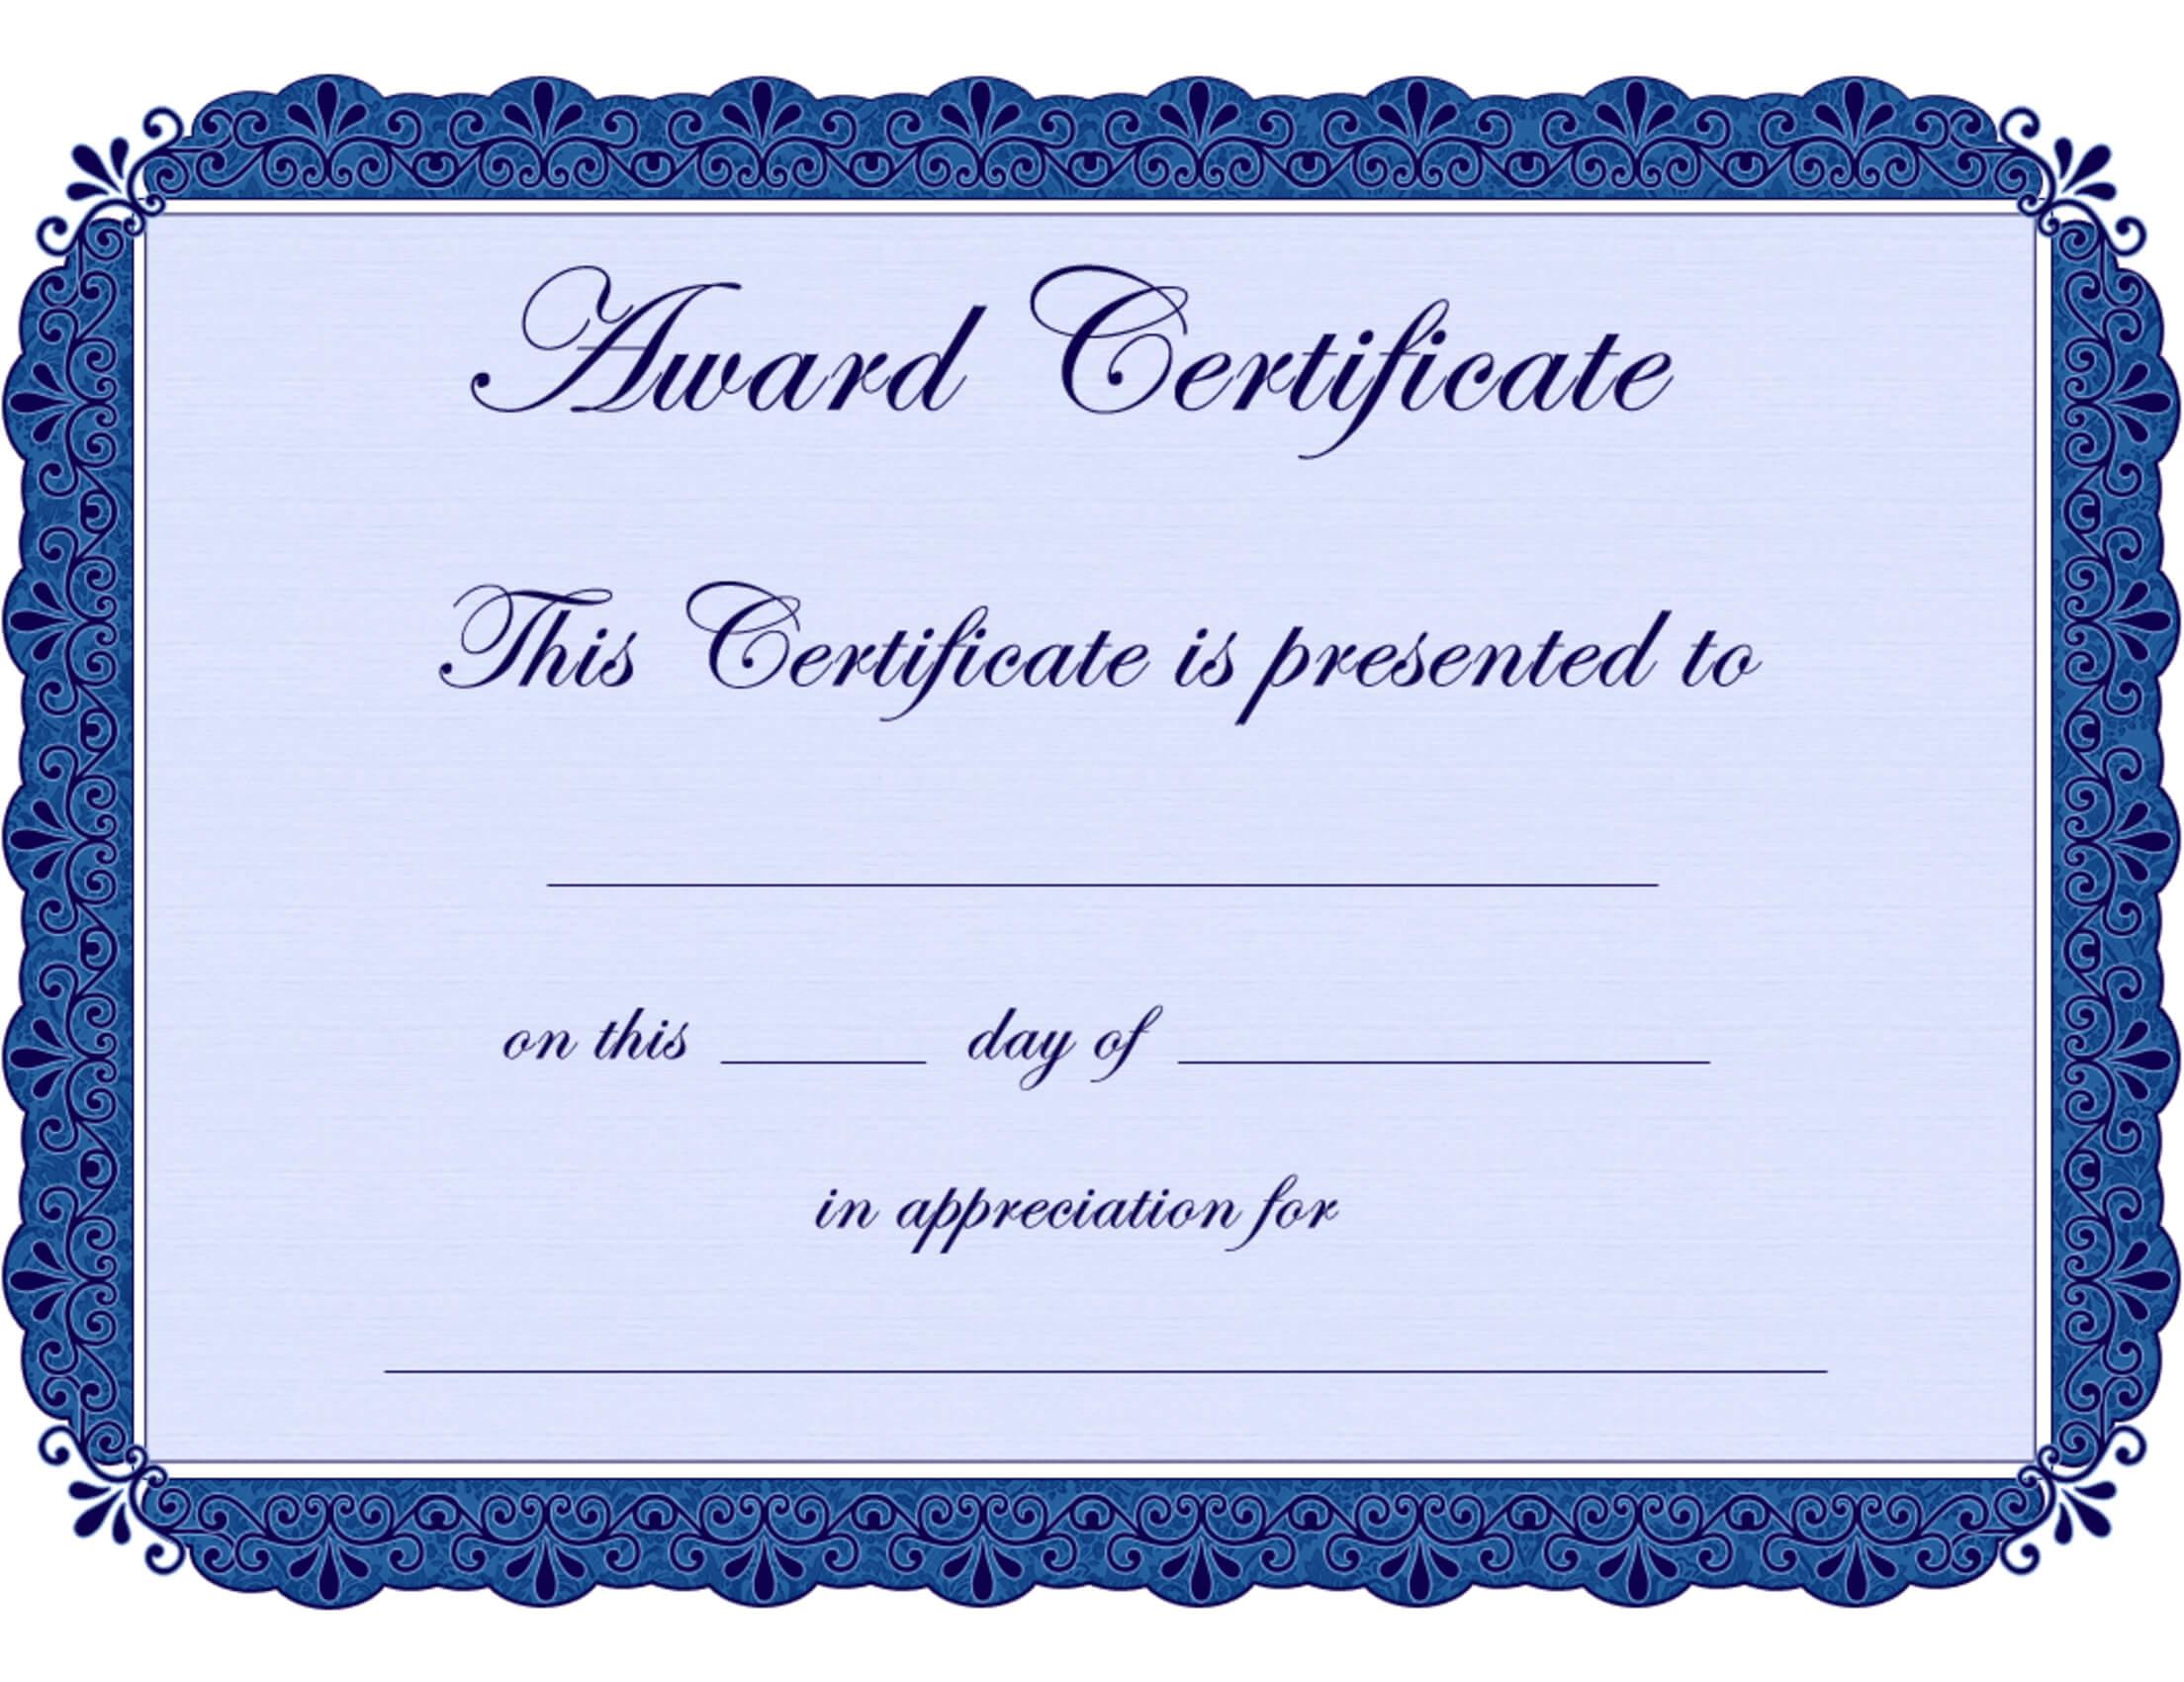 Free Printable Award Certificate Borders |  Award throughout Free Printable Funny Certificate Templates